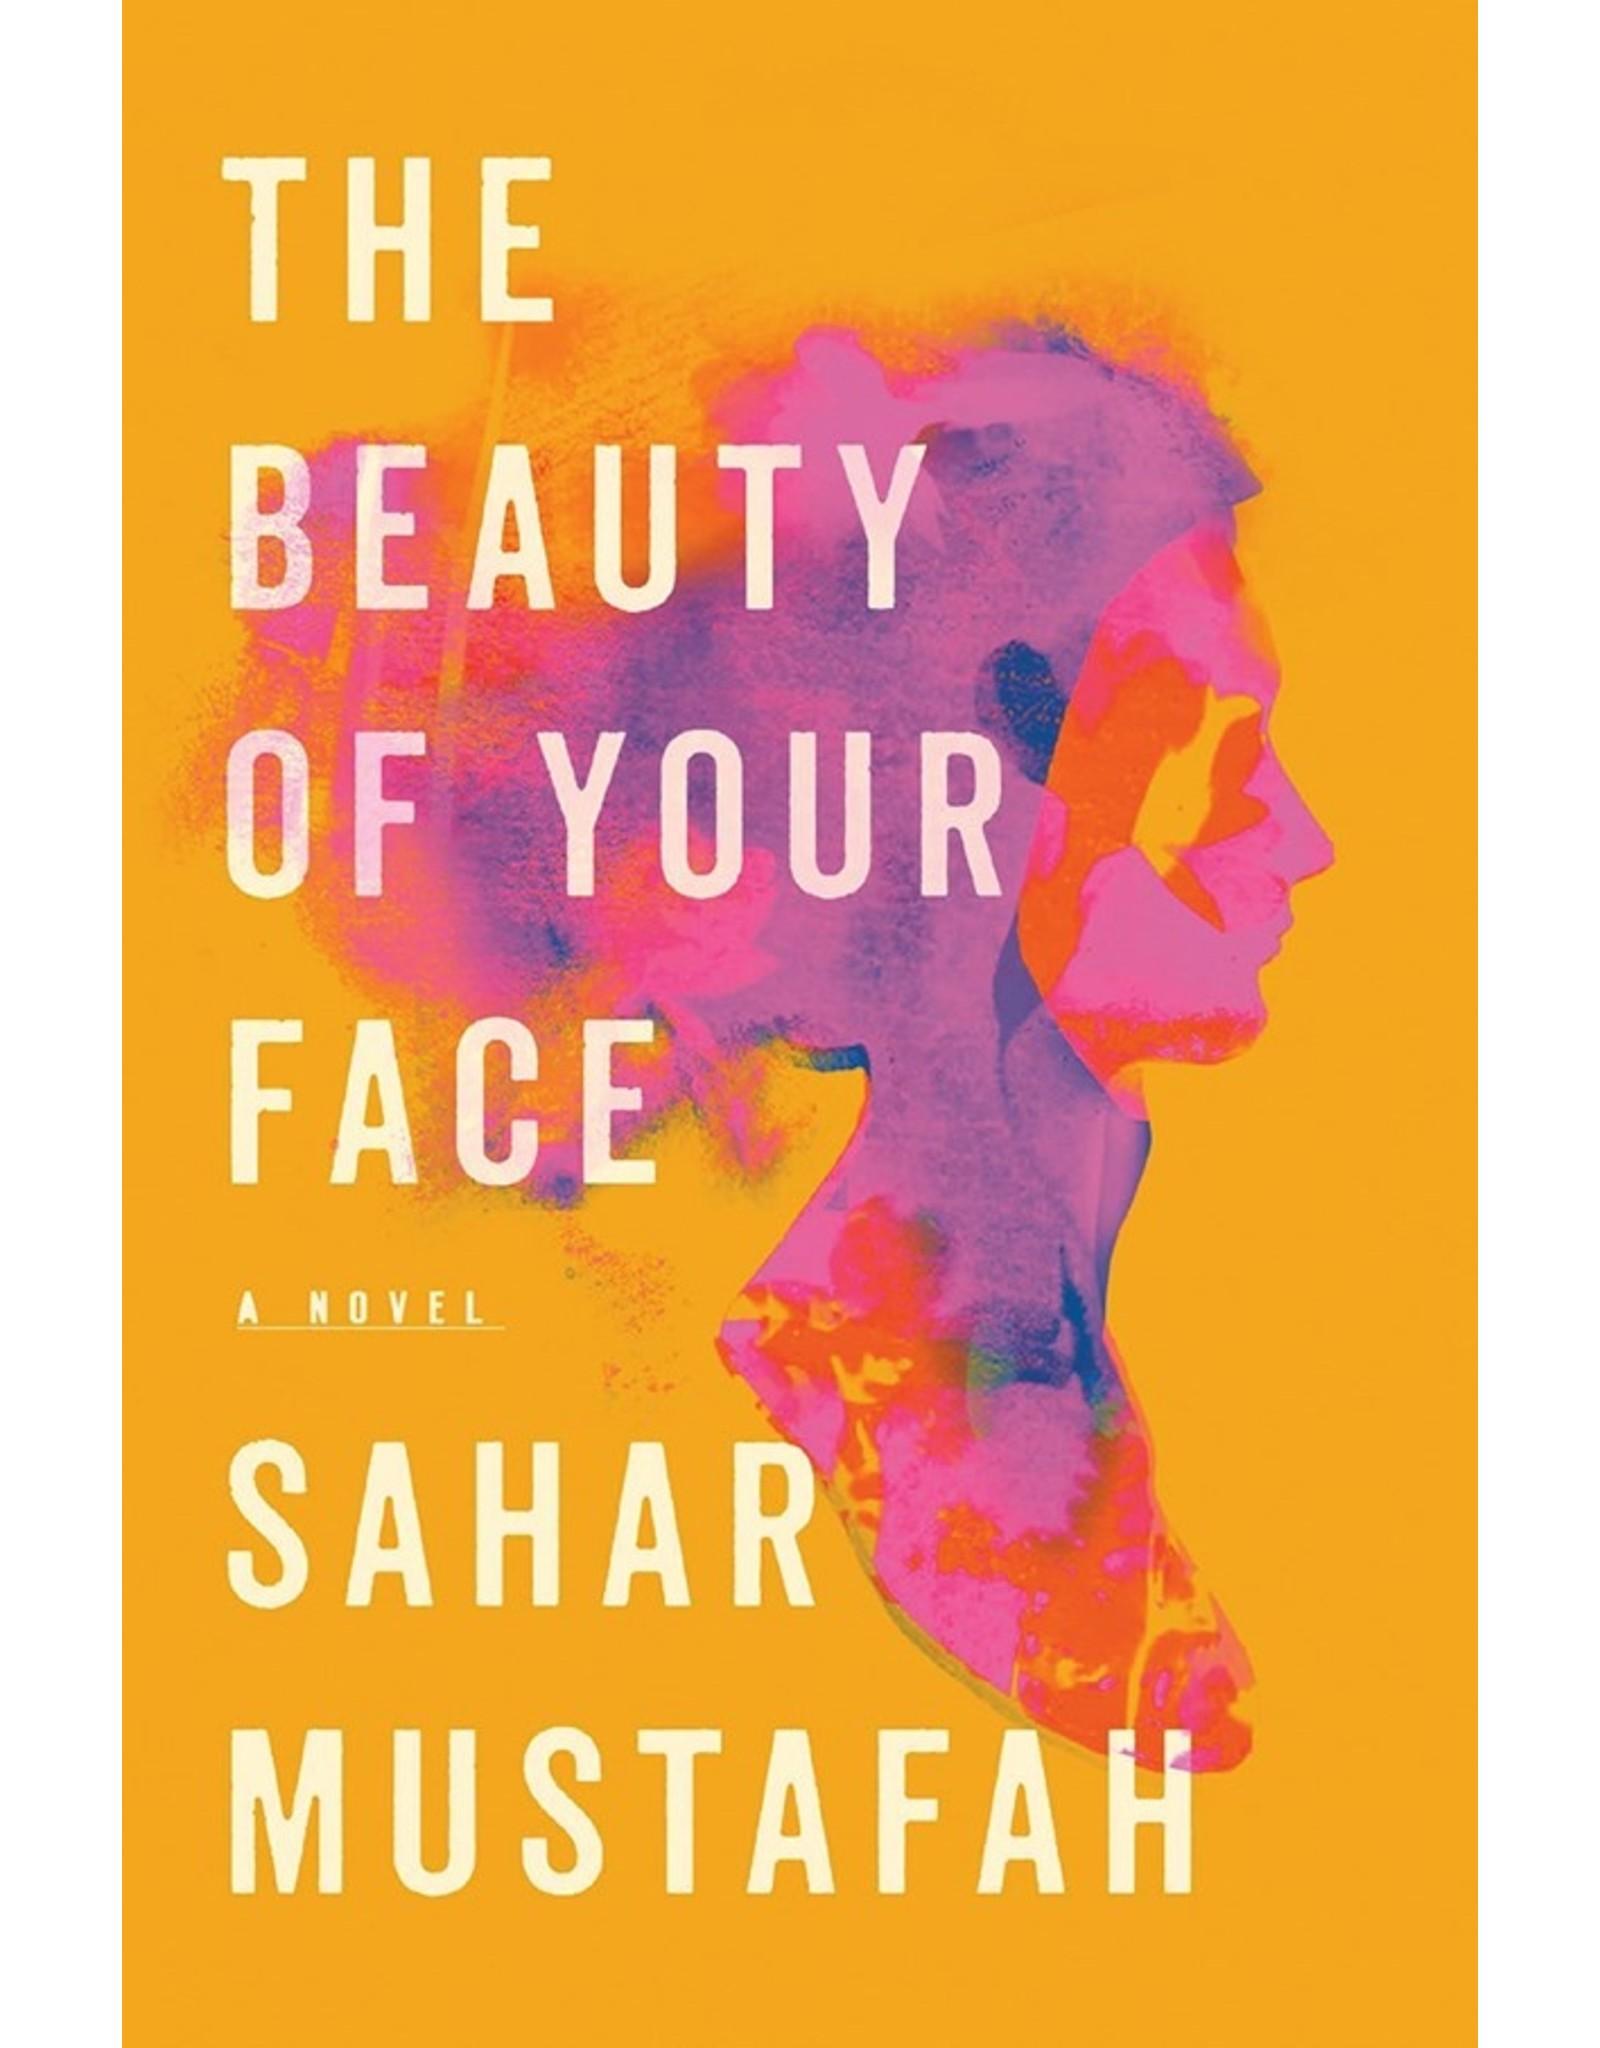 Books The Beauty of Your Face: A Novel by Sahar Mustafah (NABF21)